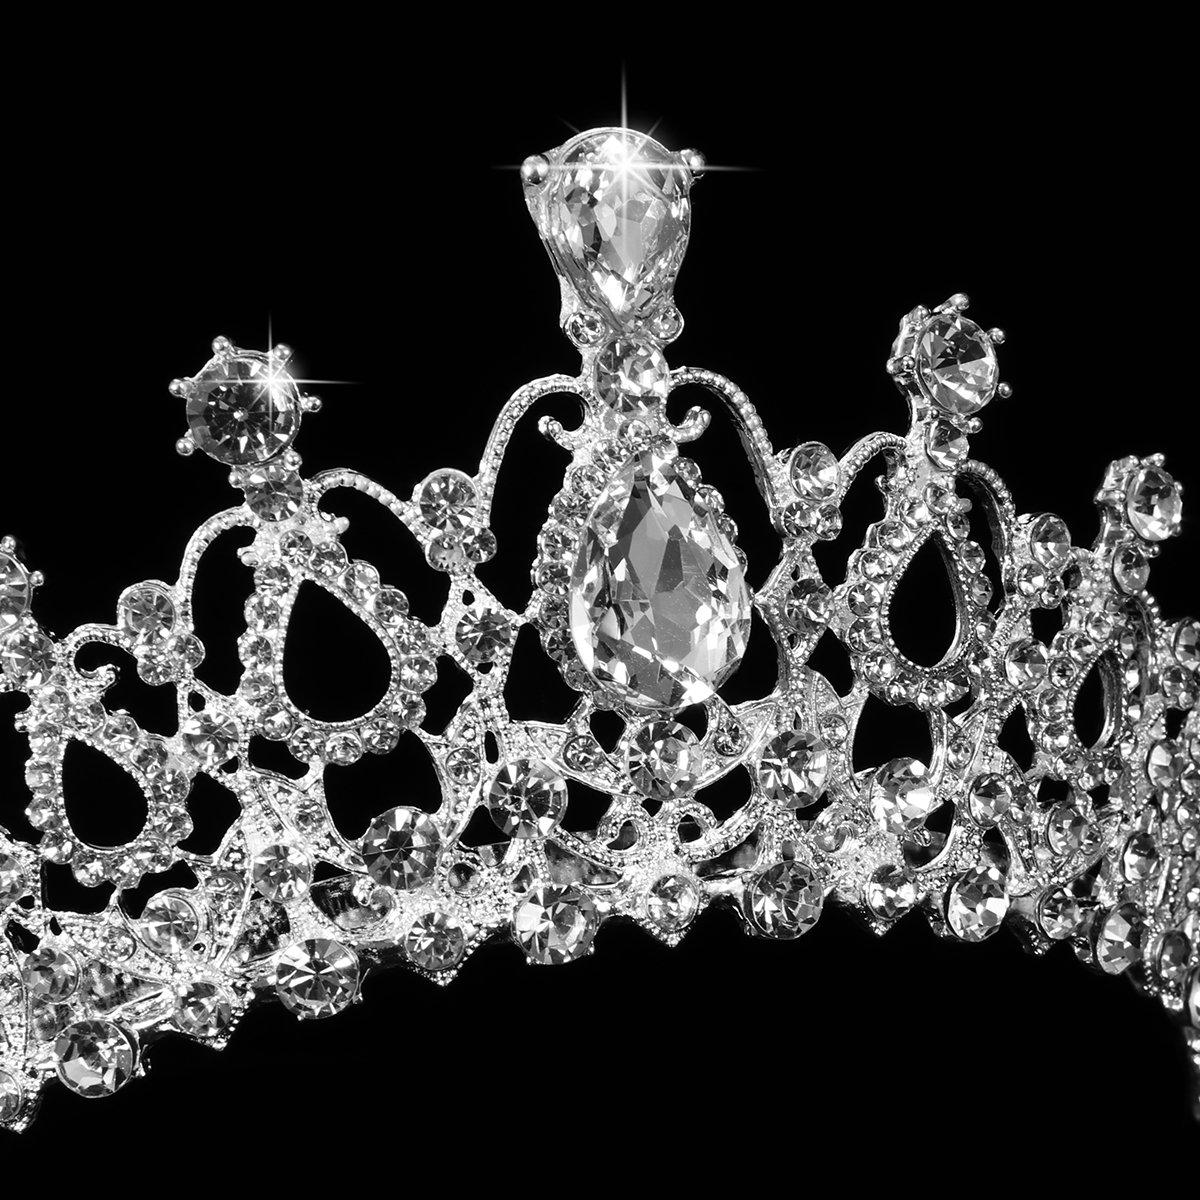 Crystal Tiara Crown Rhinestone Wedding Bridal Tiara Headband, Bridal Wedding Veil with Comb Included